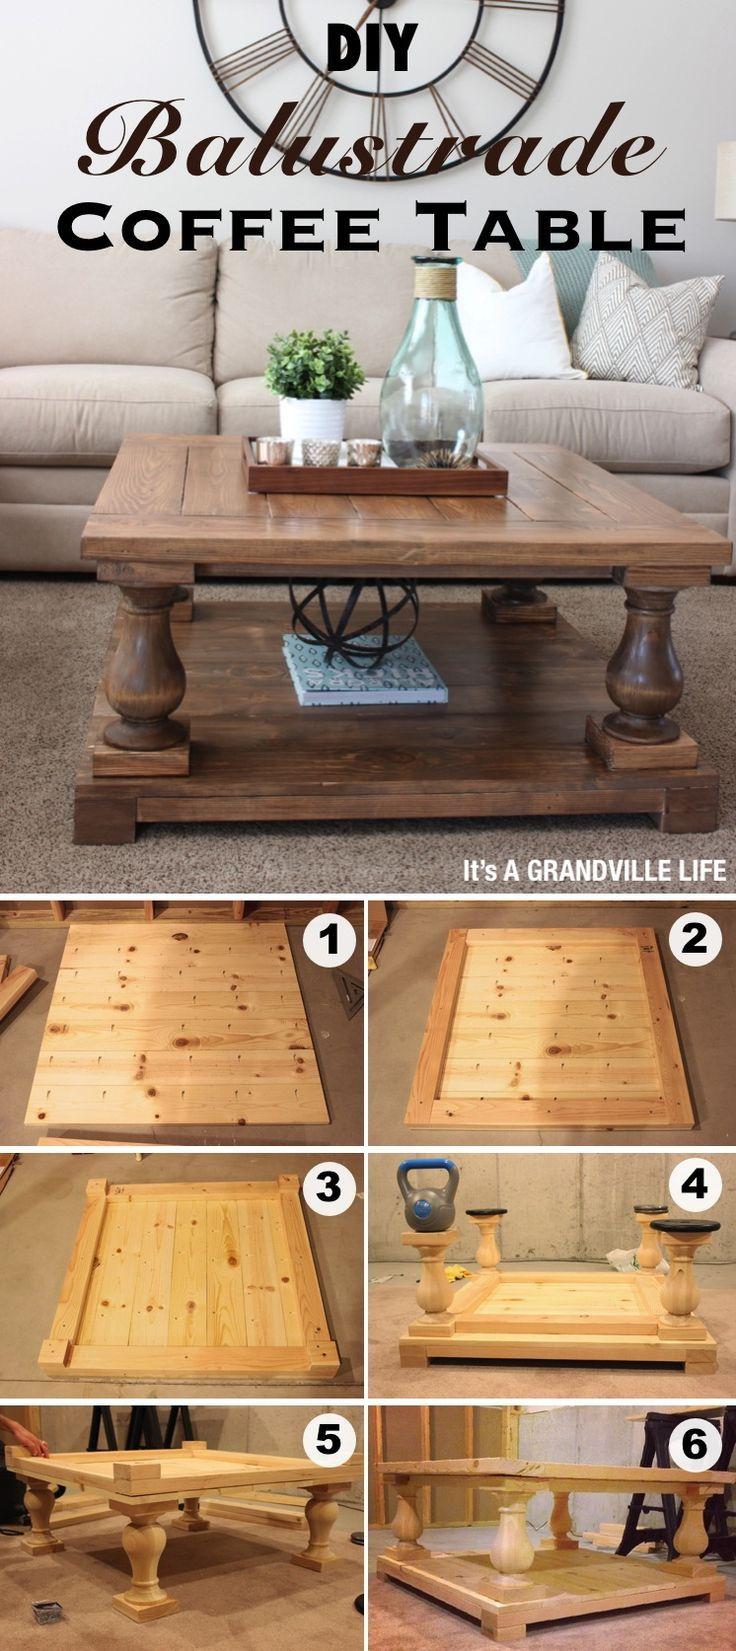 15 Creative Diy Coffee Table Ideas You Can Build Yourself Homelovr Diy Farmhouse Coffee Table Diy Furniture Plans Coffee Table Farmhouse